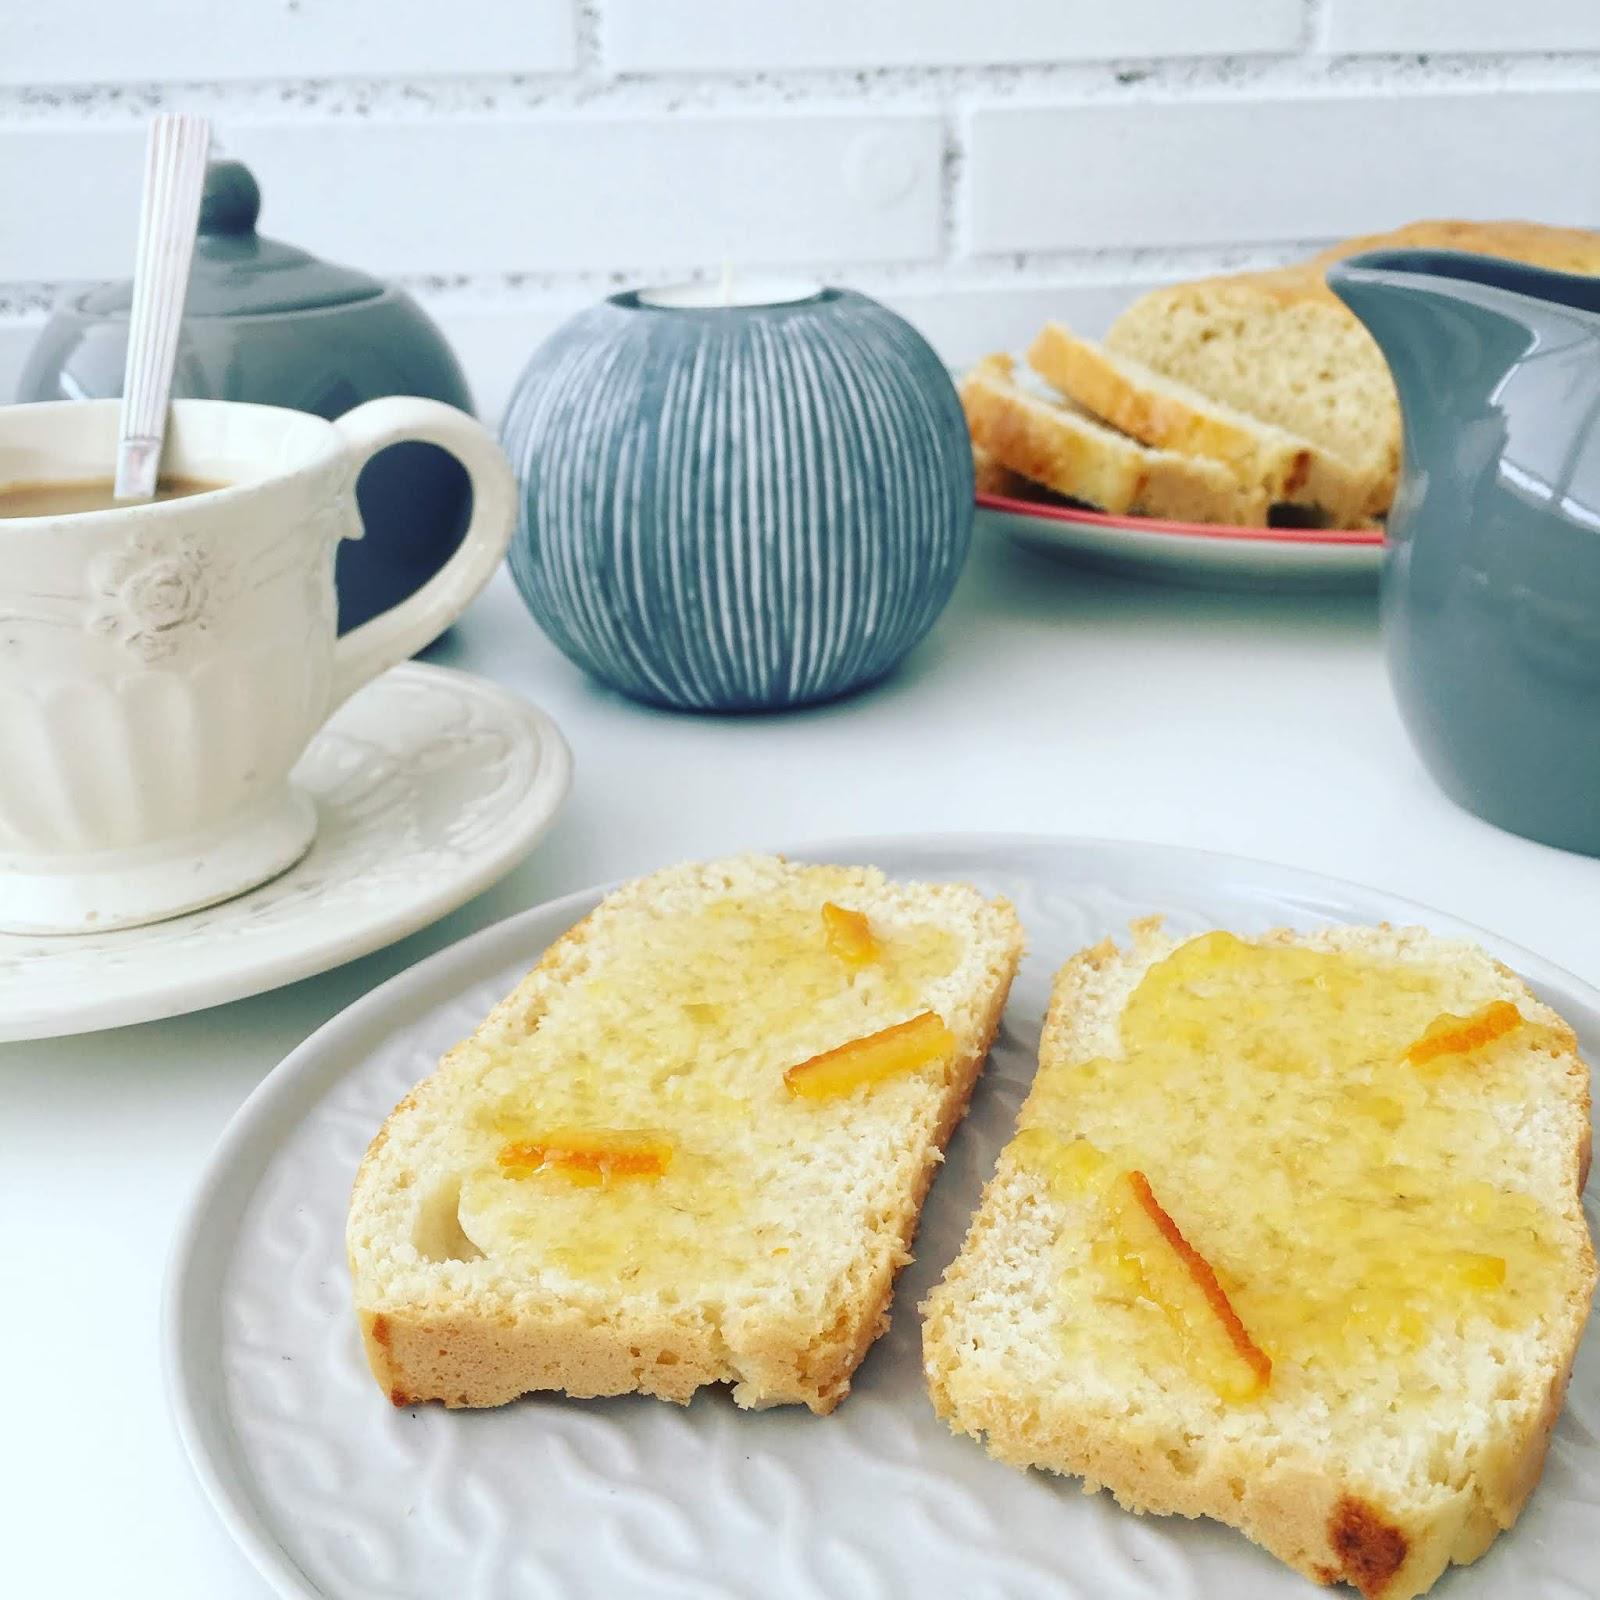 pan mas sano para desayunar